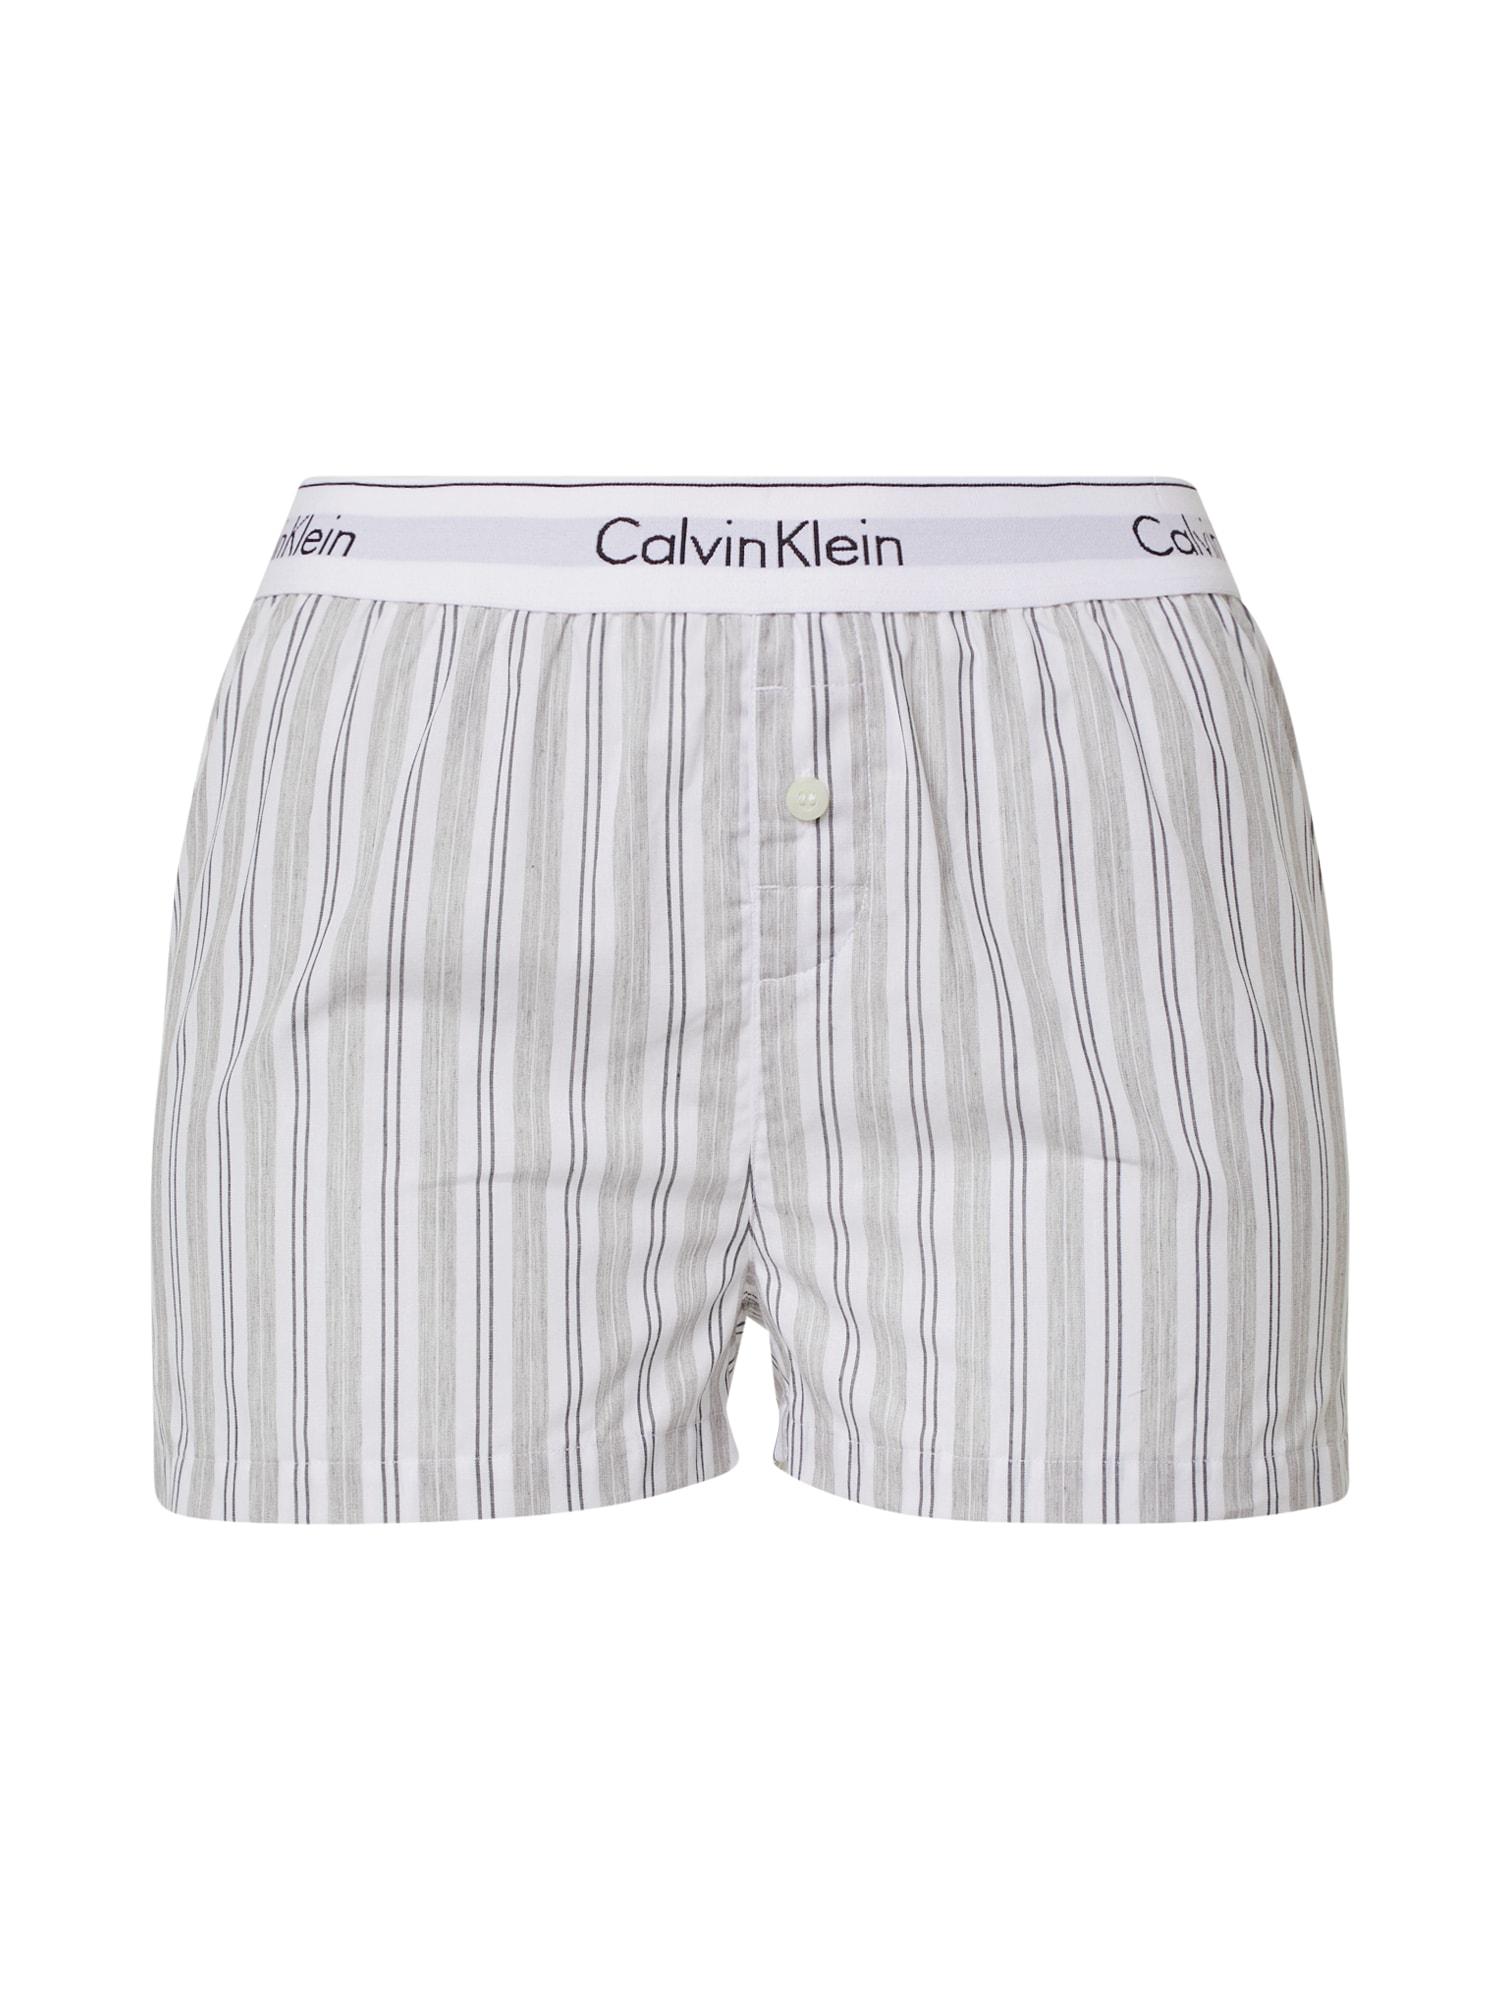 Calvin Klein Underwear Pižaminės kelnės balta / pilka